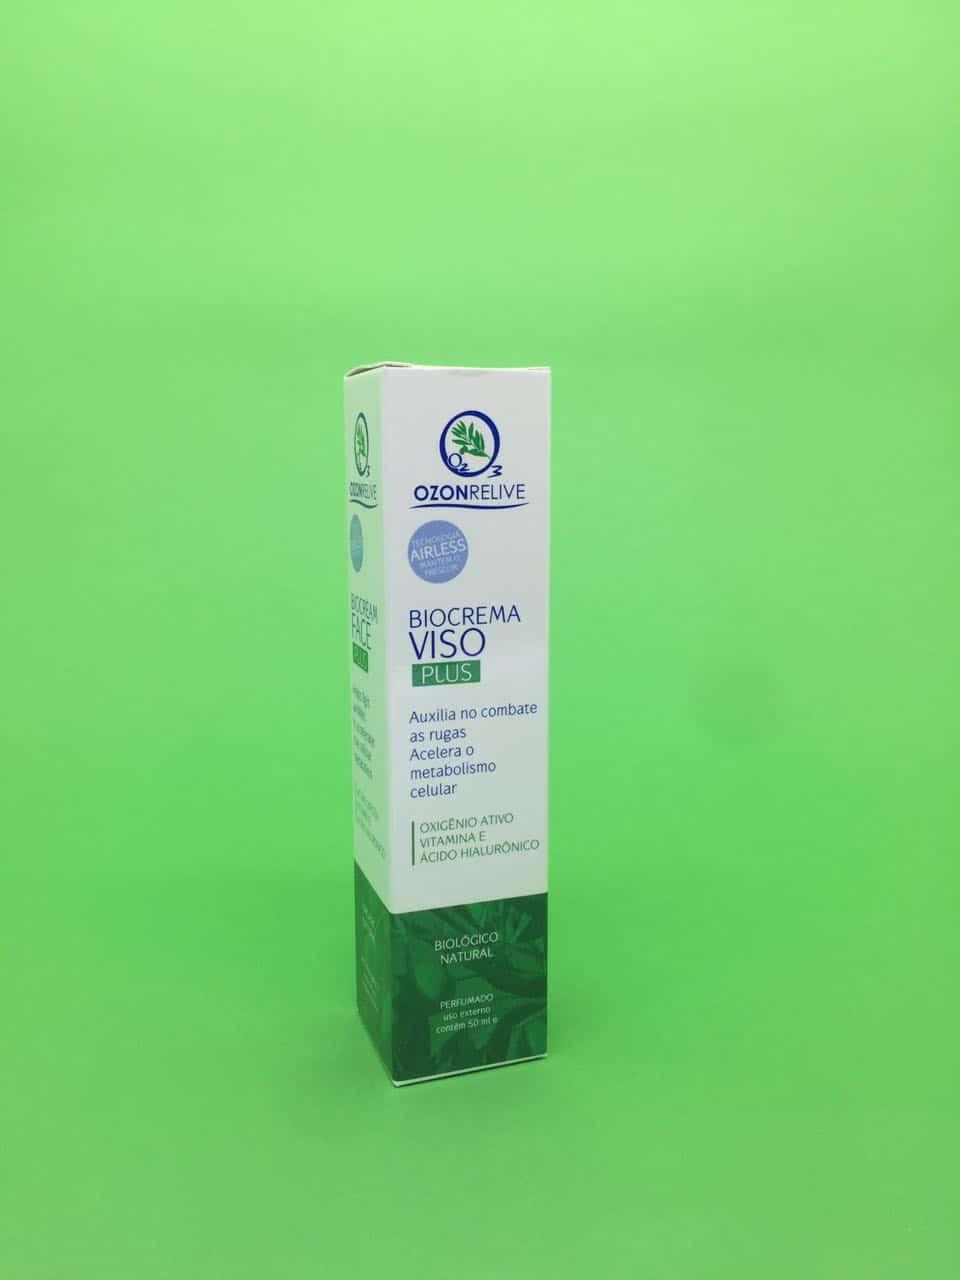 Ozonrelive Biocrema Viso Plus 1a